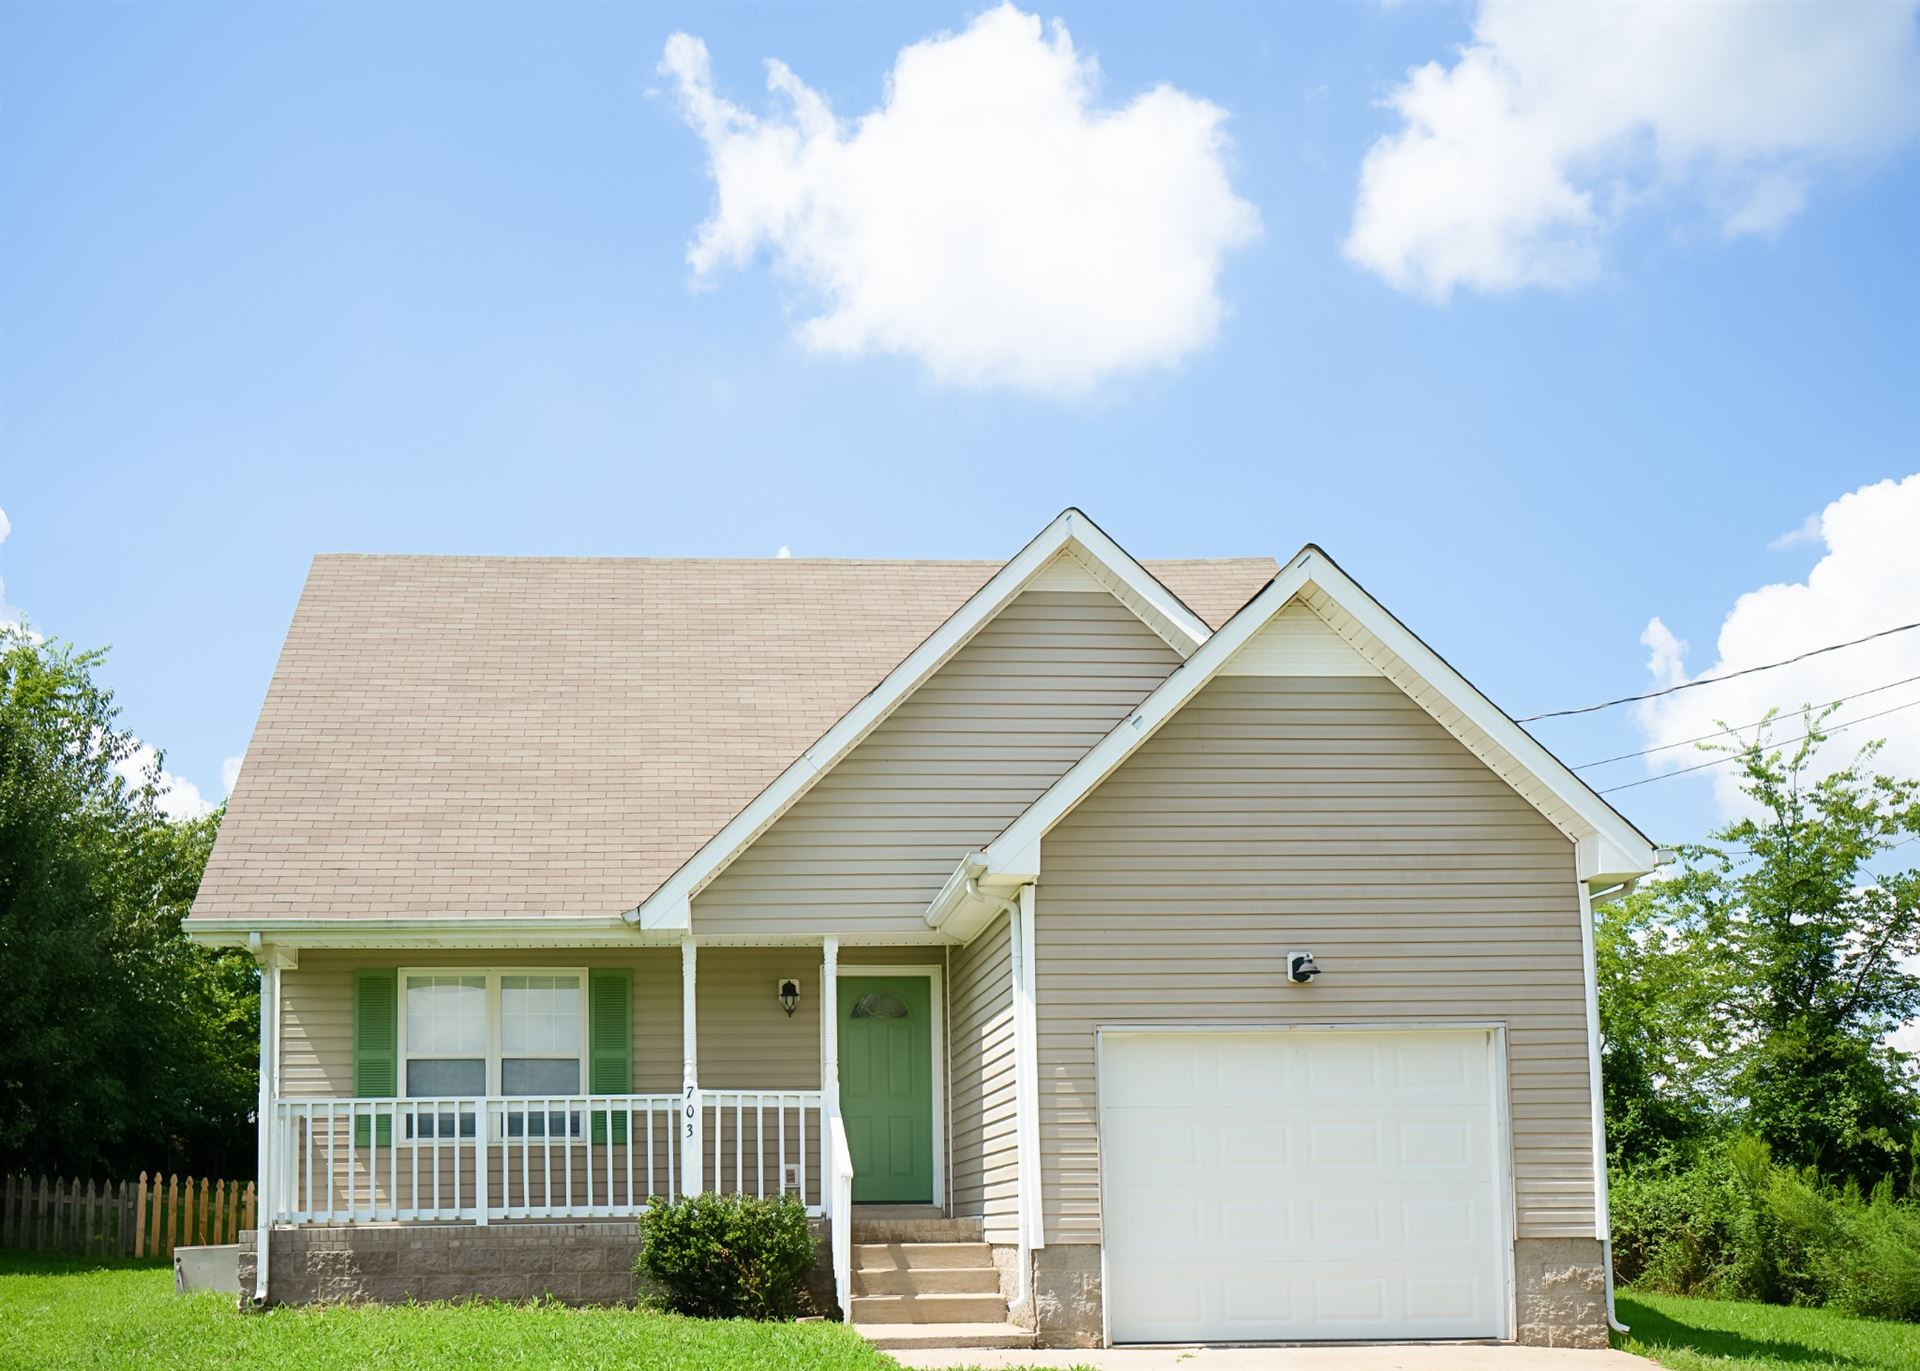 703 Artic Ave, Oak Grove, KY 42262 - MLS#: 2197523